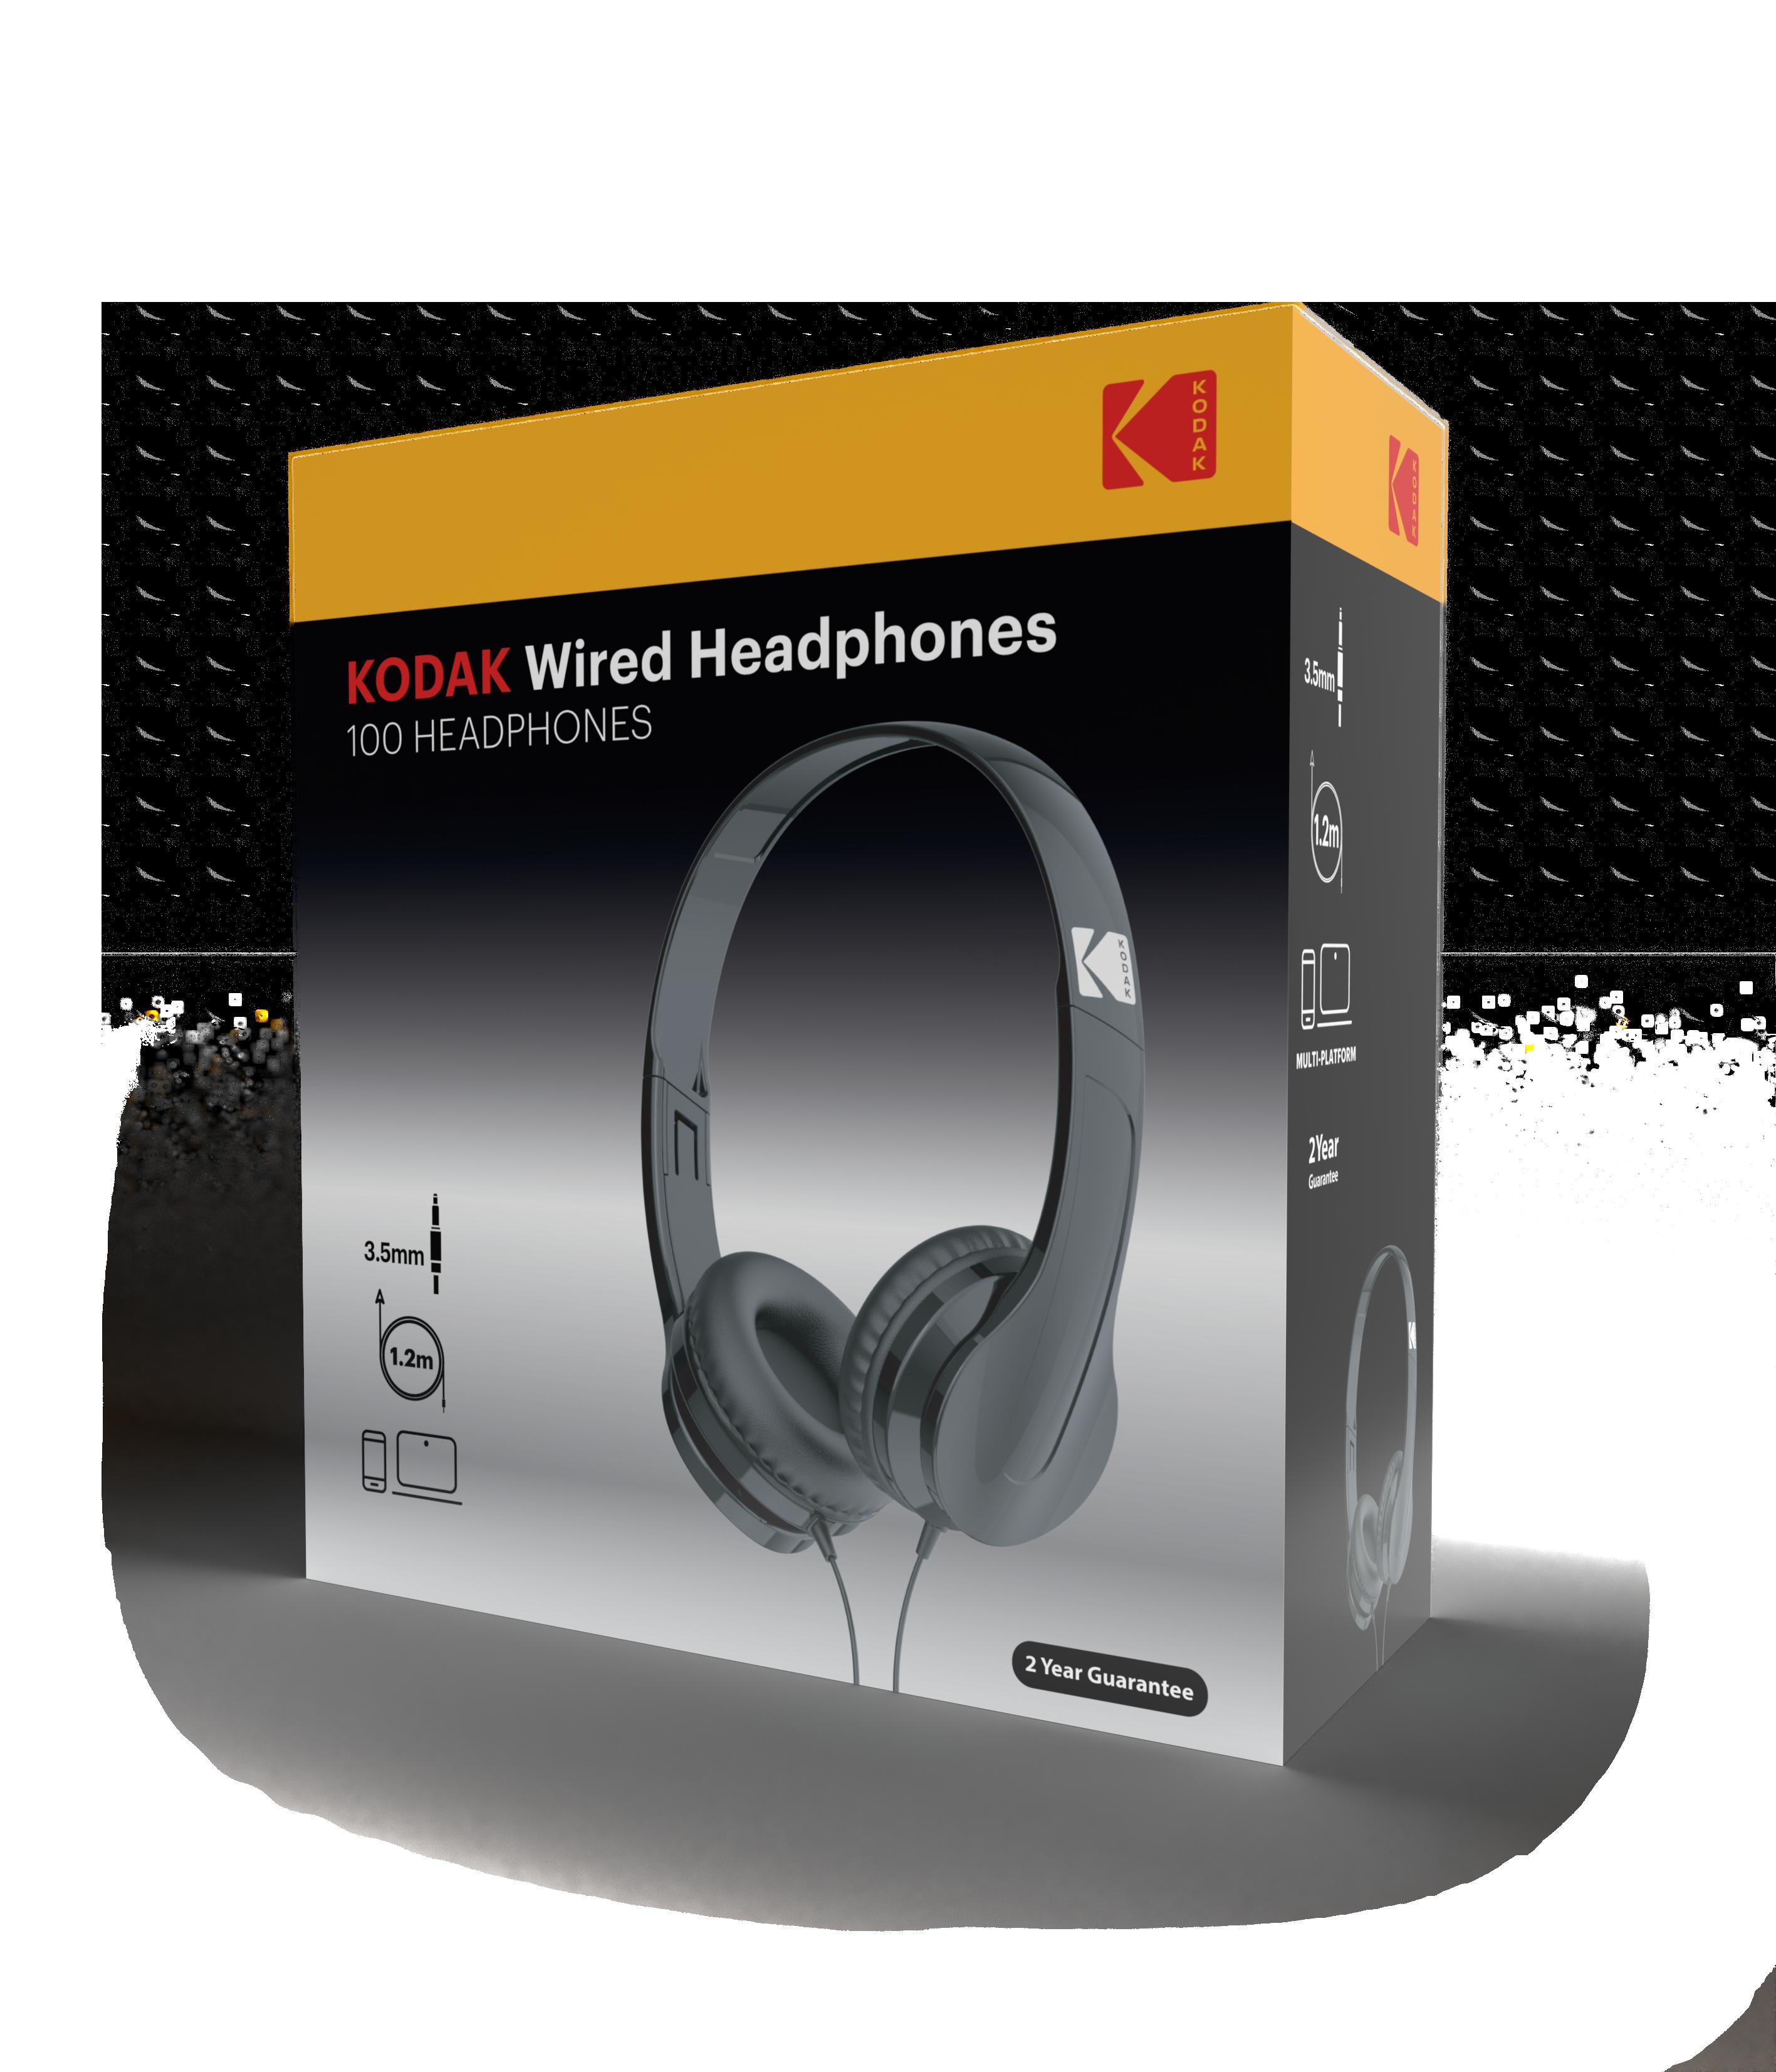 KODAK Headphones